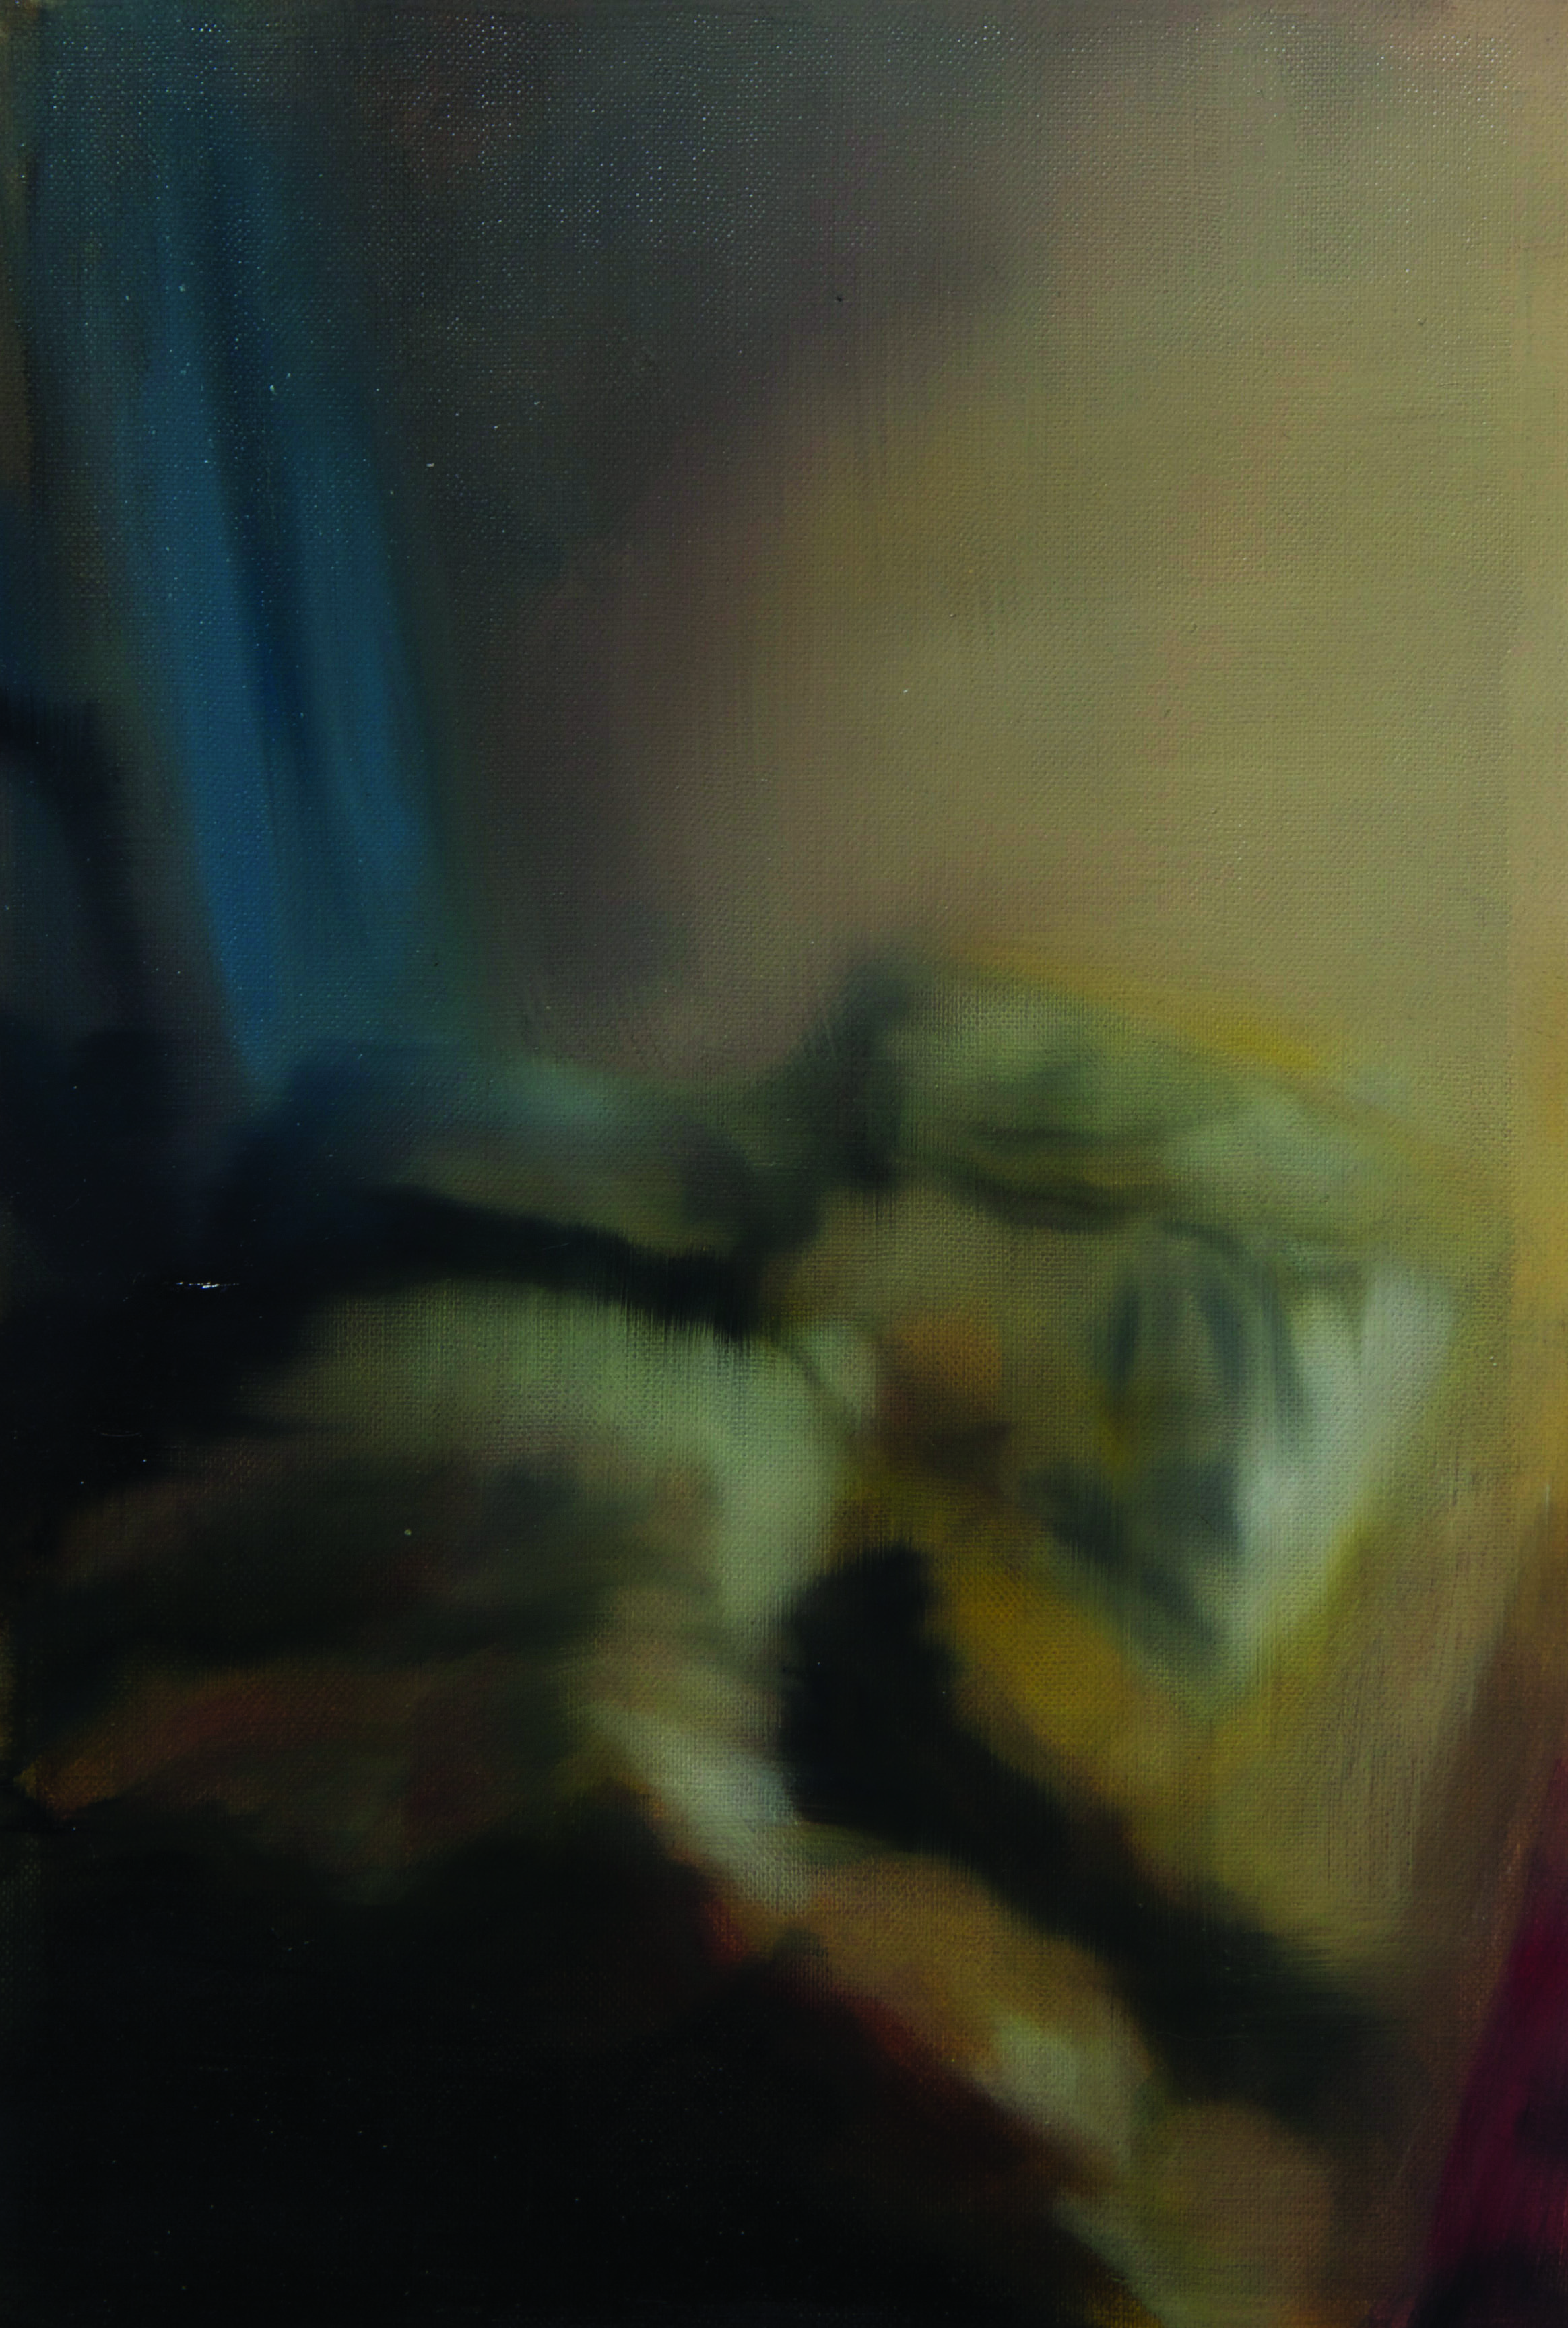 Bed Oil on linen (580x440) 2011